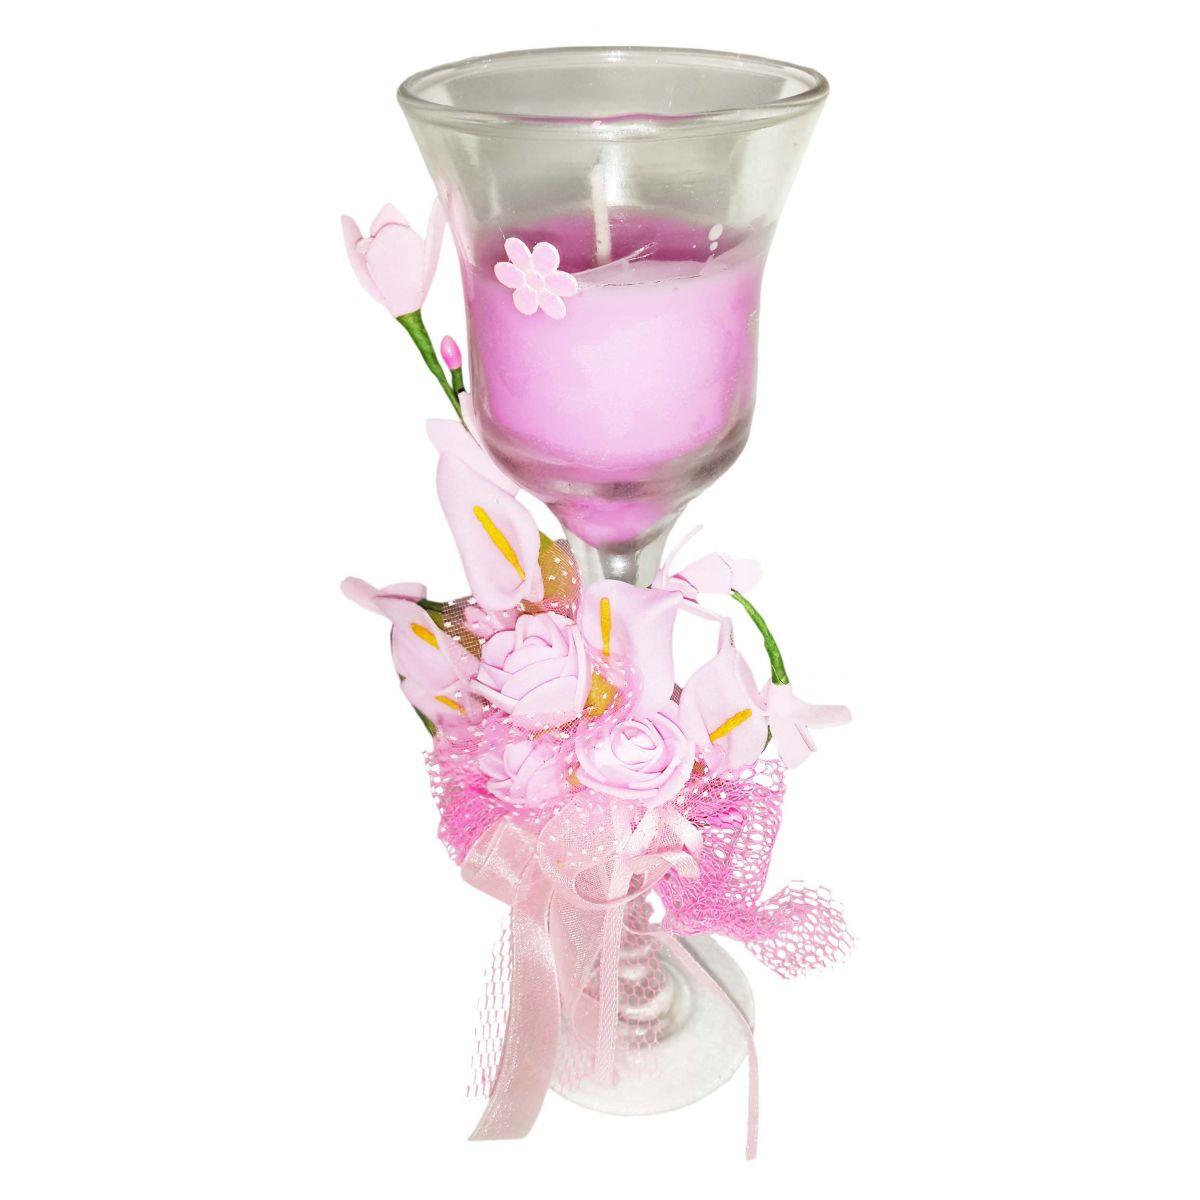 Vela Parafina Perfumada Decorativa Media Fragrancia Flores Rosa (WL-B)